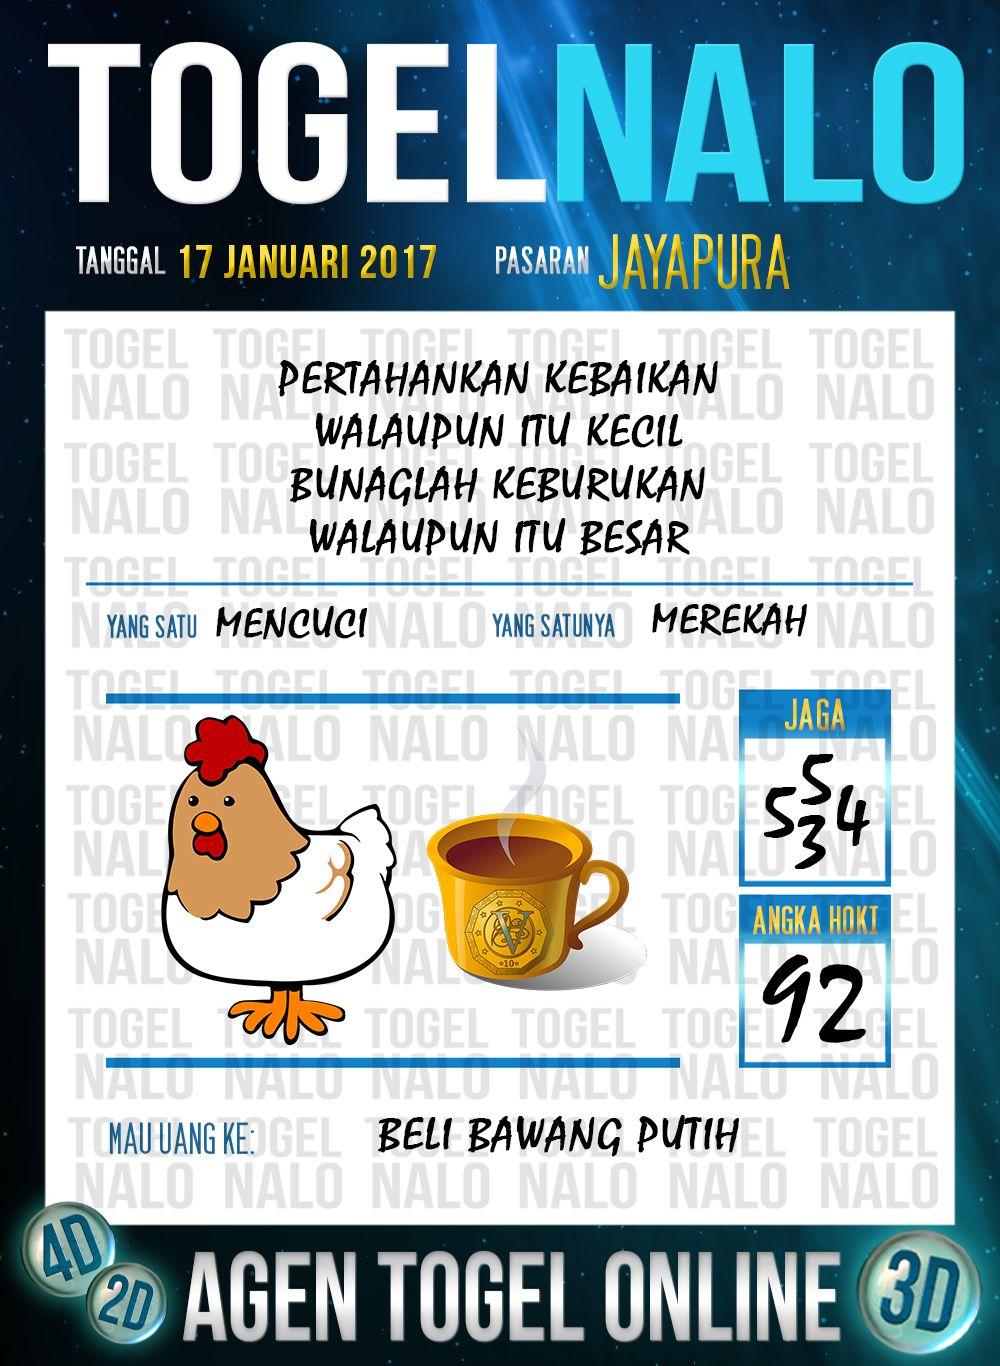 Kop Jitu 3D Togel Wap Online Live Draw 4D TogelNalo Jayapura 17 Januari 2017